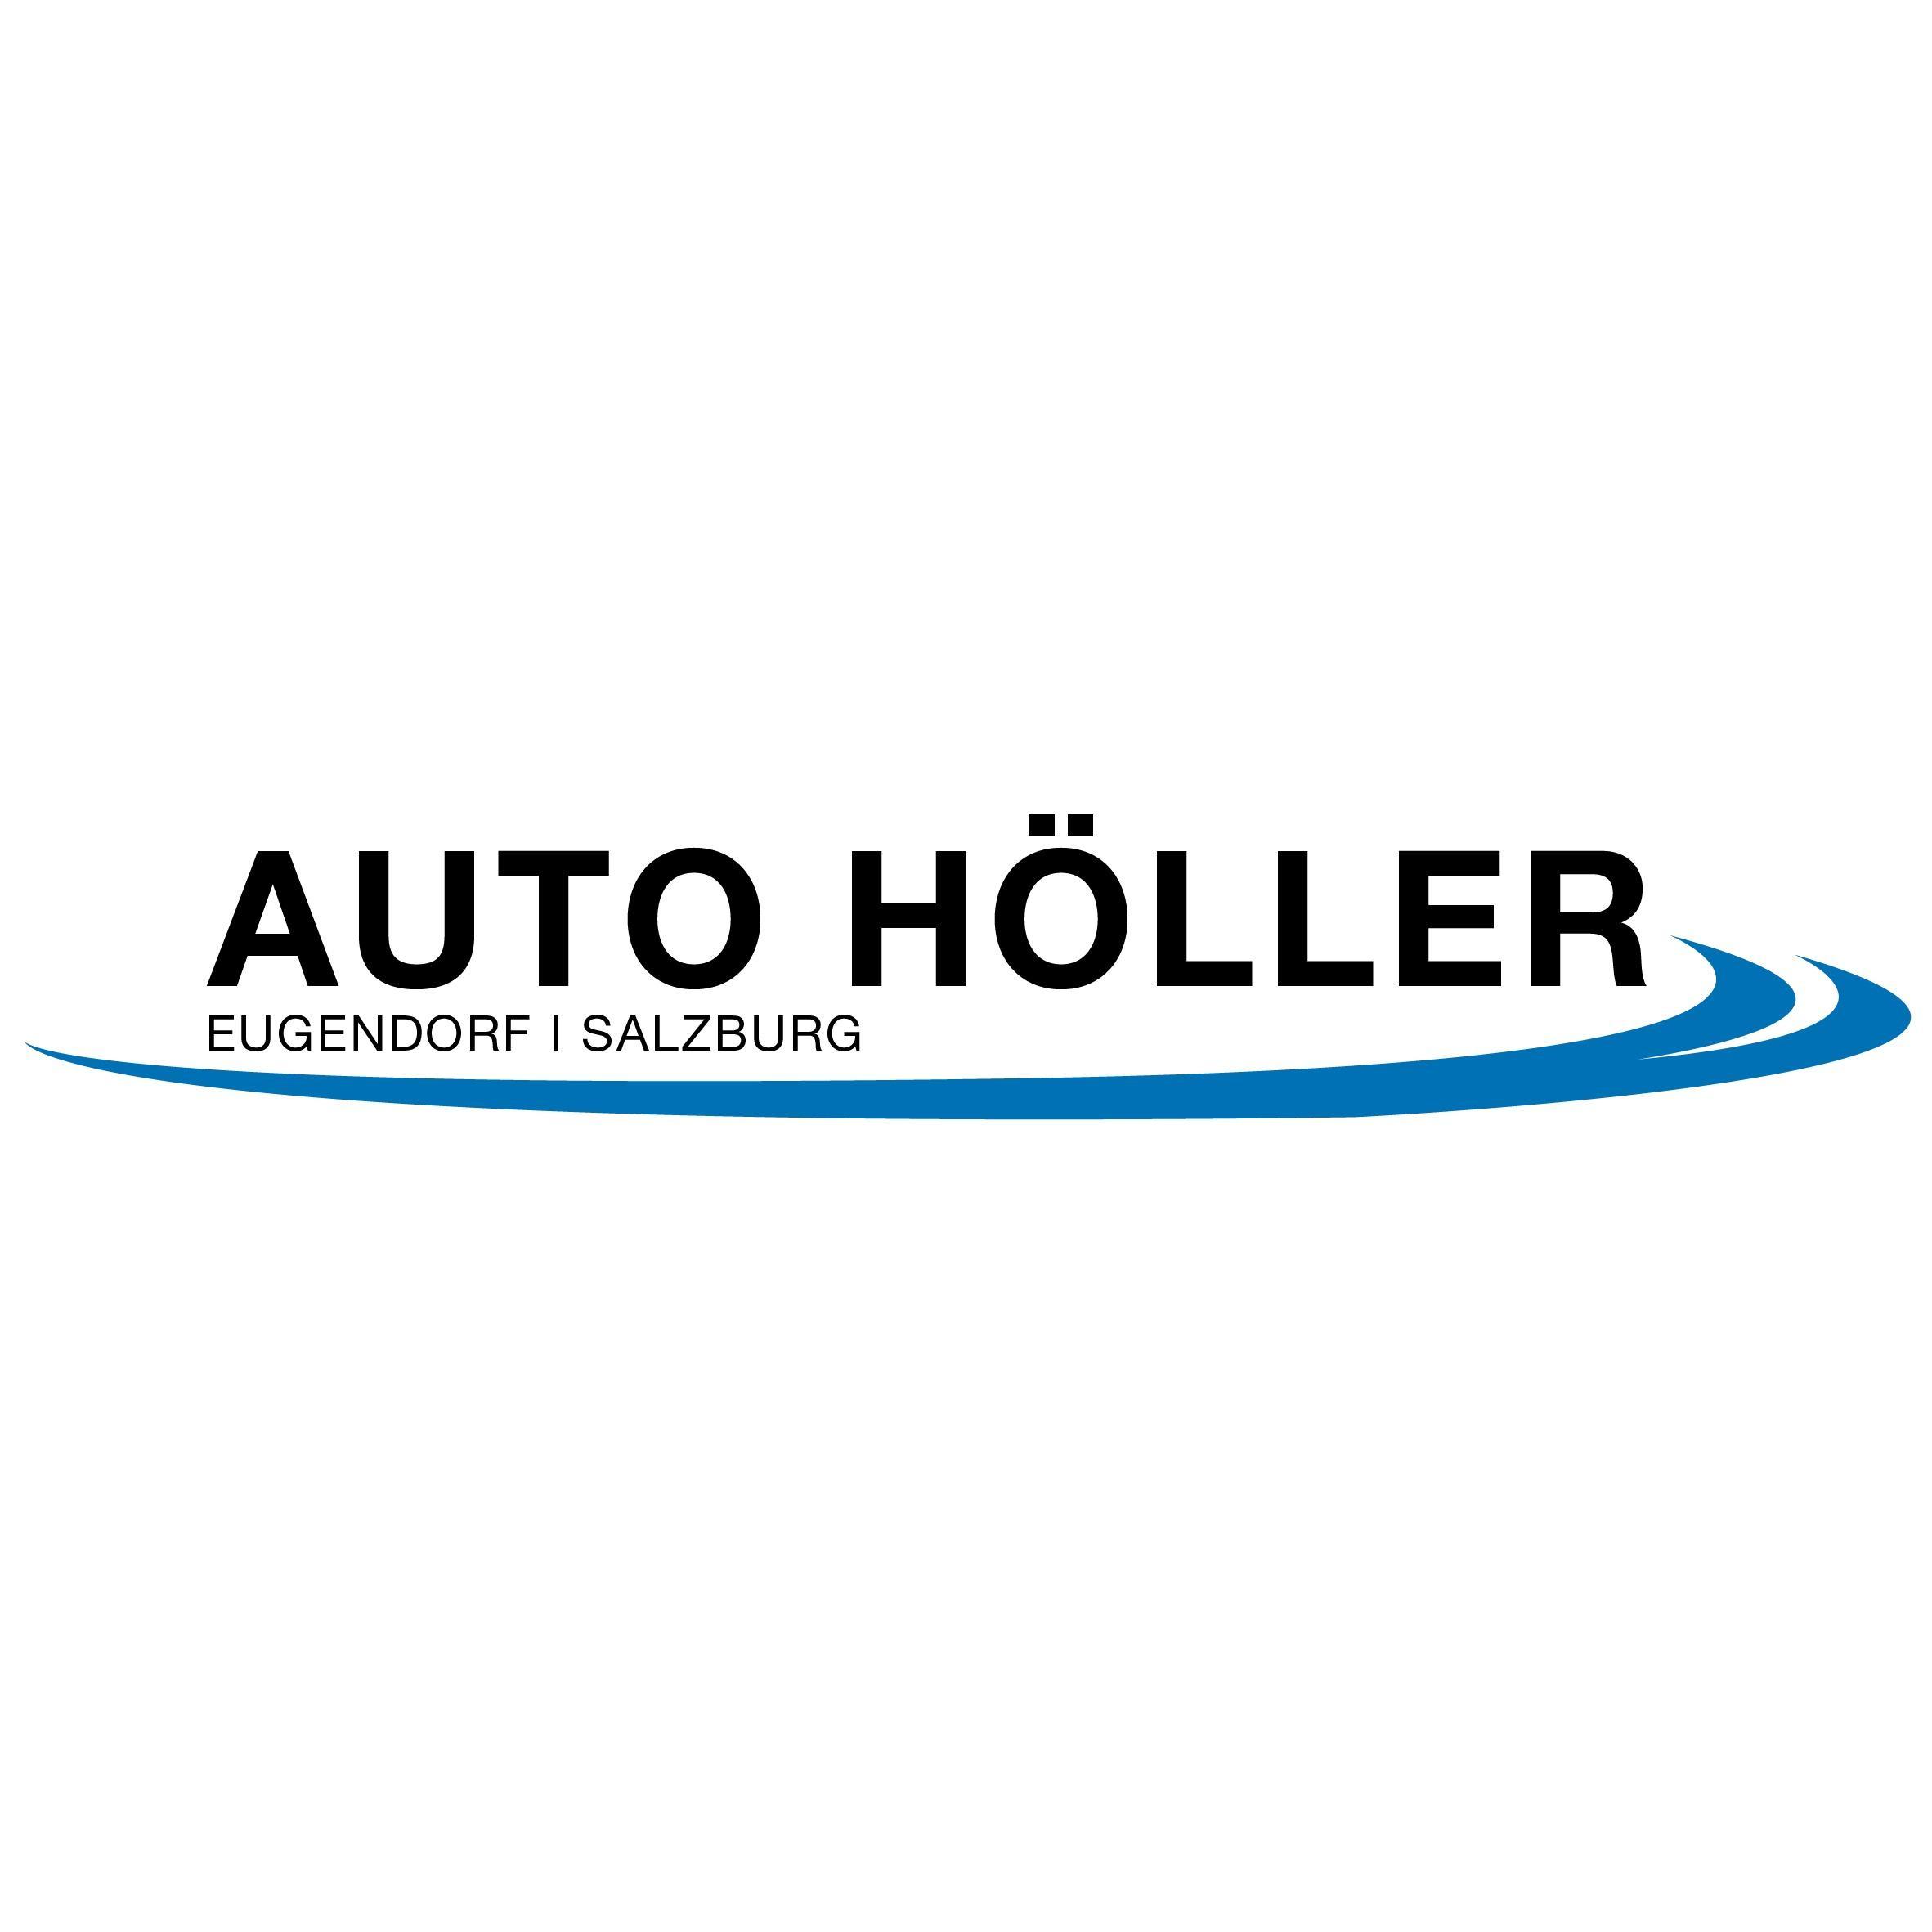 Auto Höller GmbH & Co KG - Logo